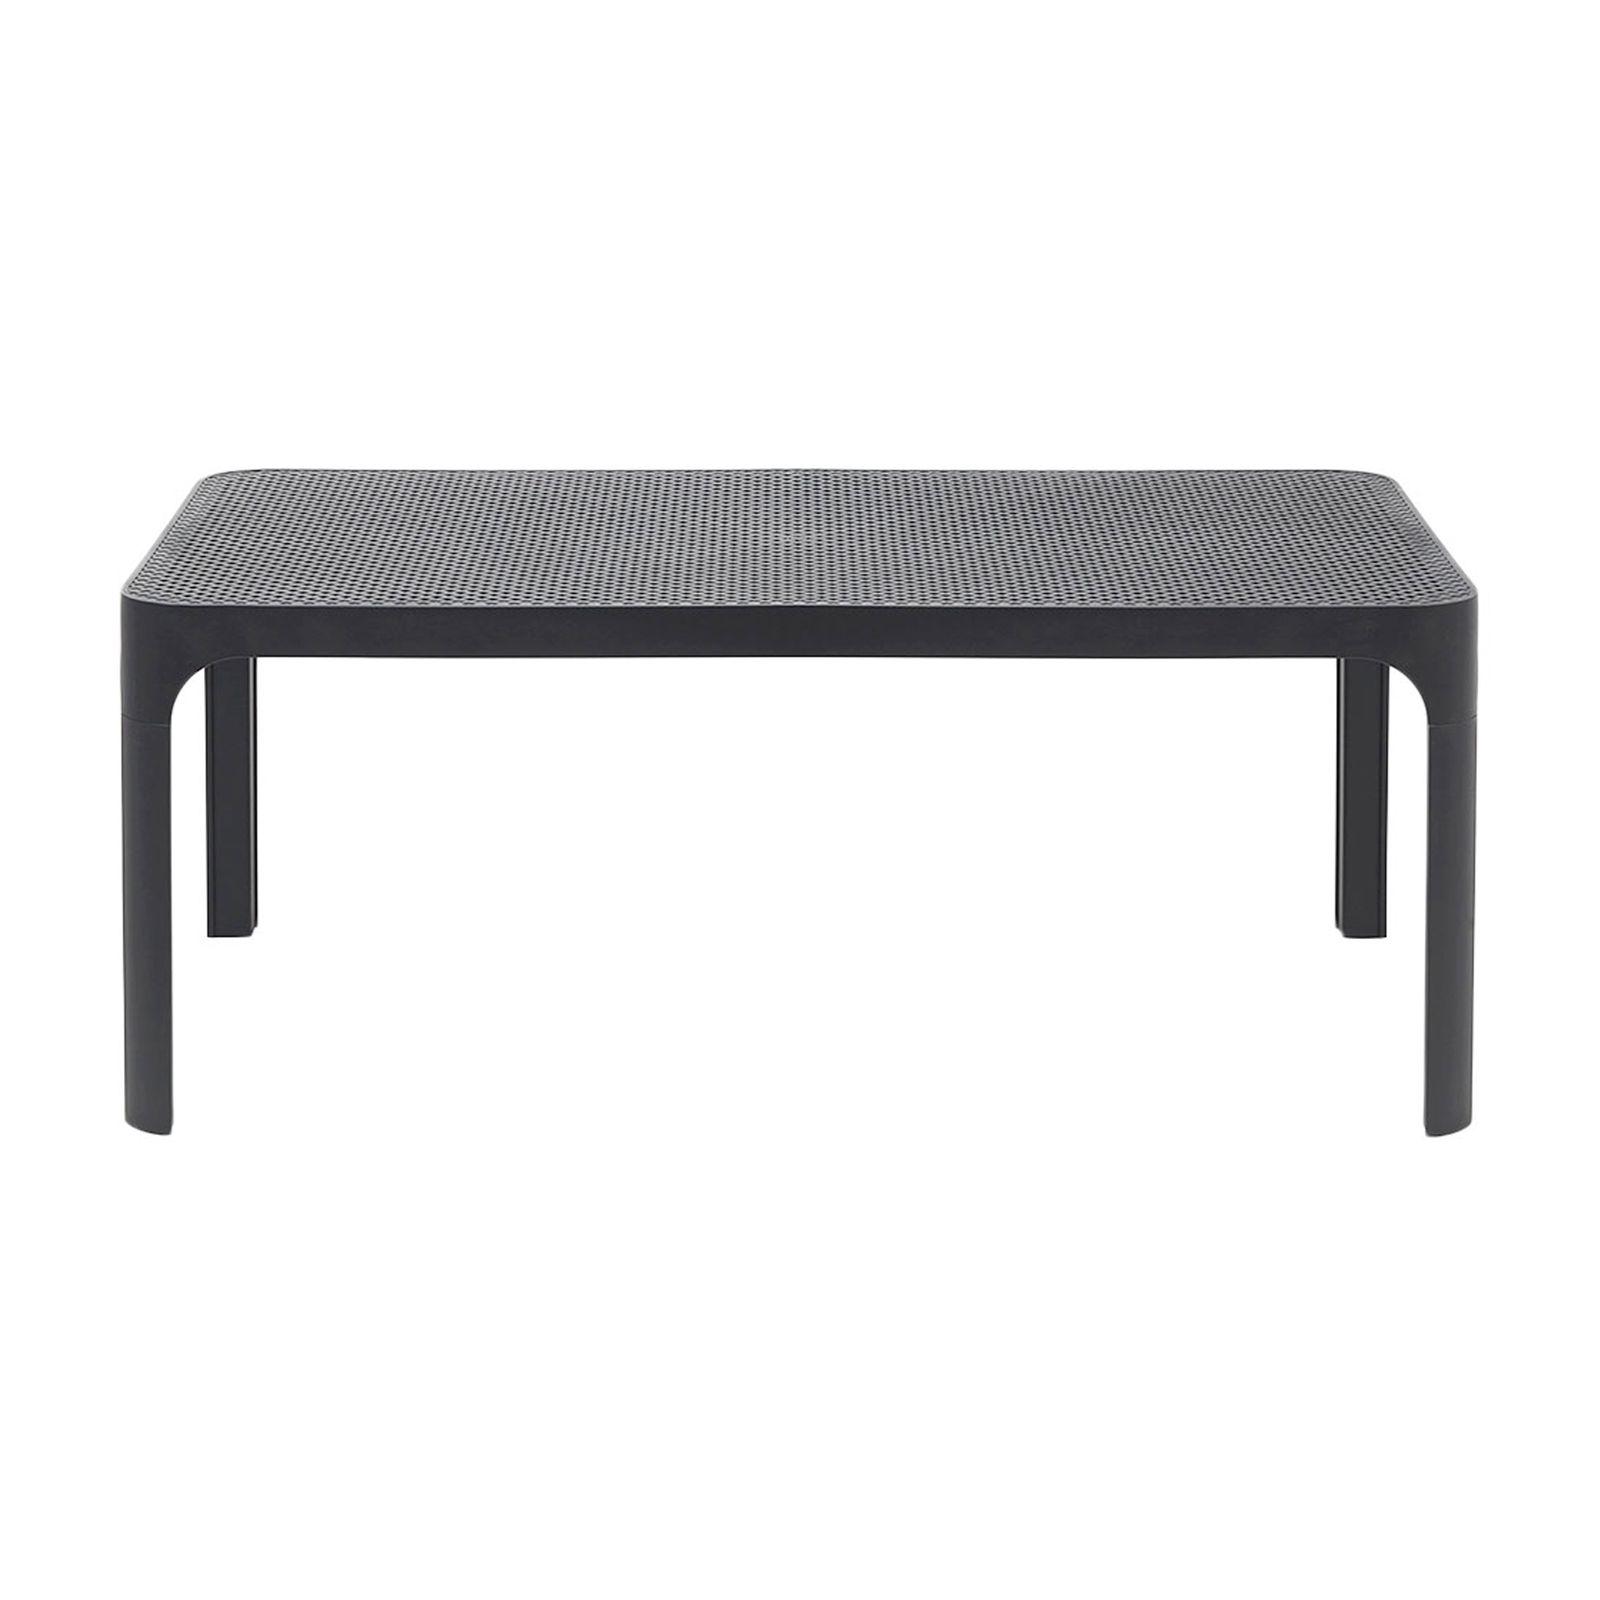 Tavolo da giardino Net antracite 100 x 60 cm NARDI